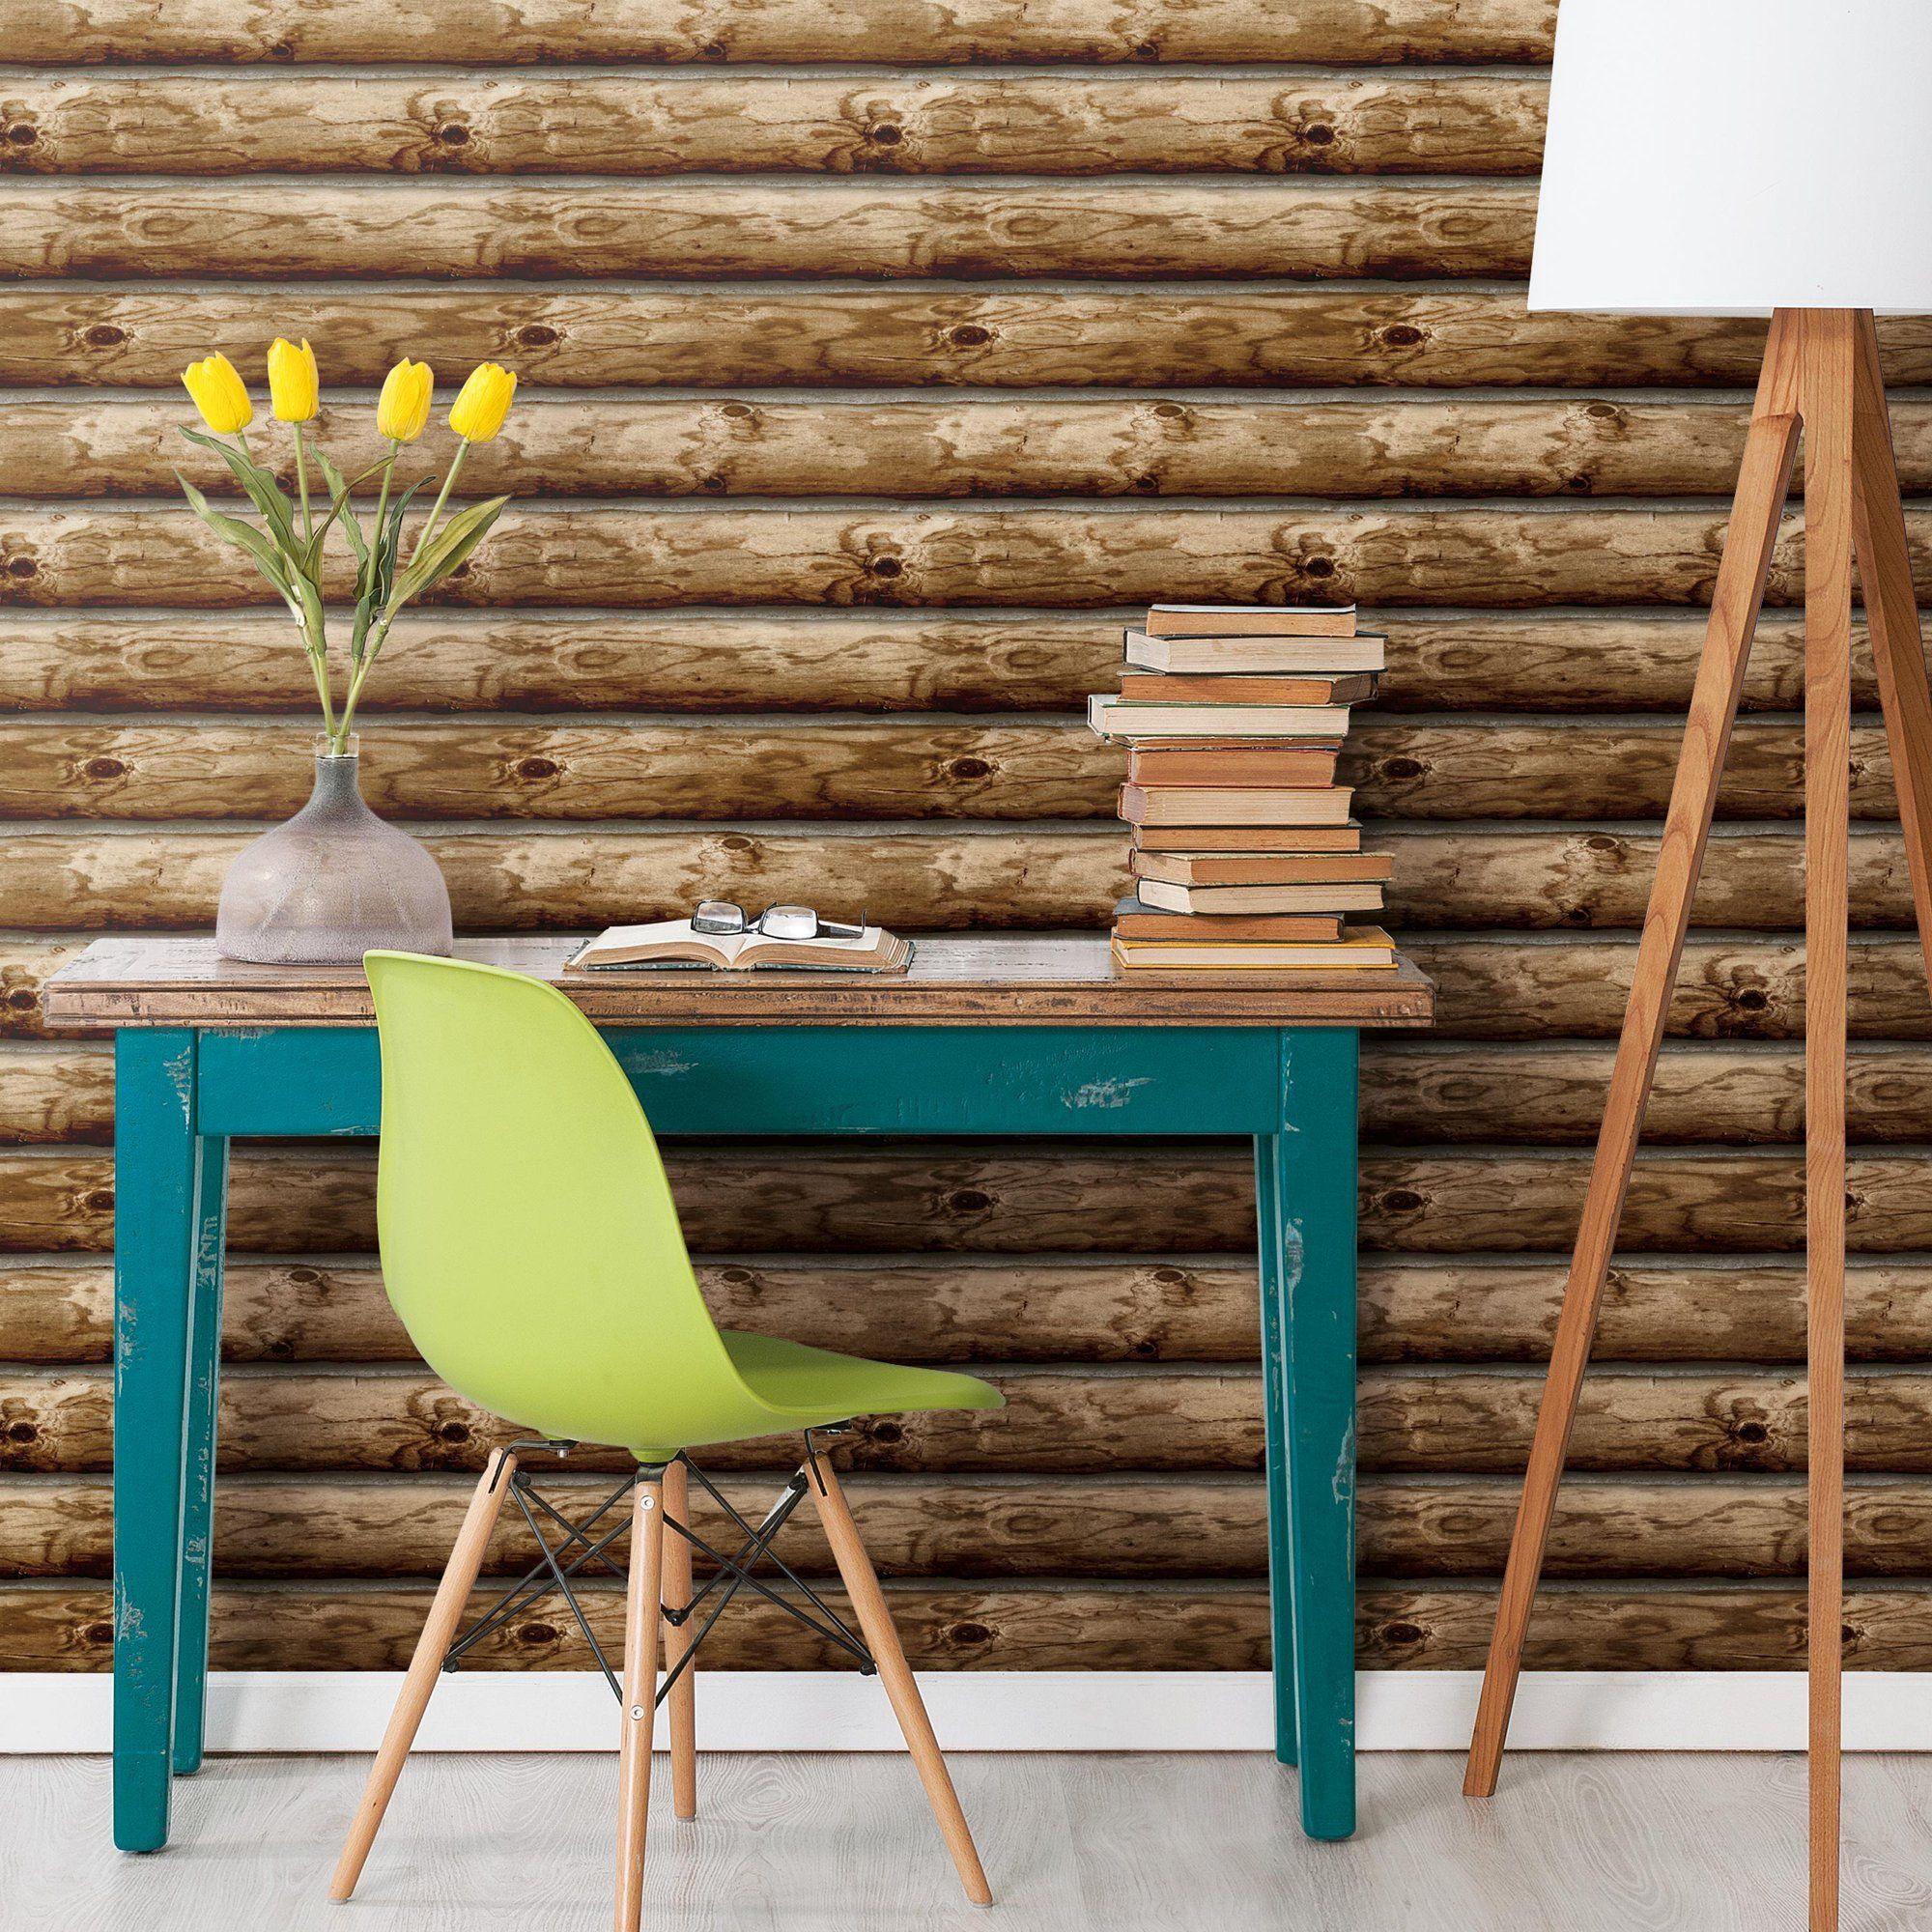 Roommates Cabin Logs Peel And Stick Wallpaper Walmart Com Log Wallpaper Peel And Stick Wallpaper Peelable Wallpaper